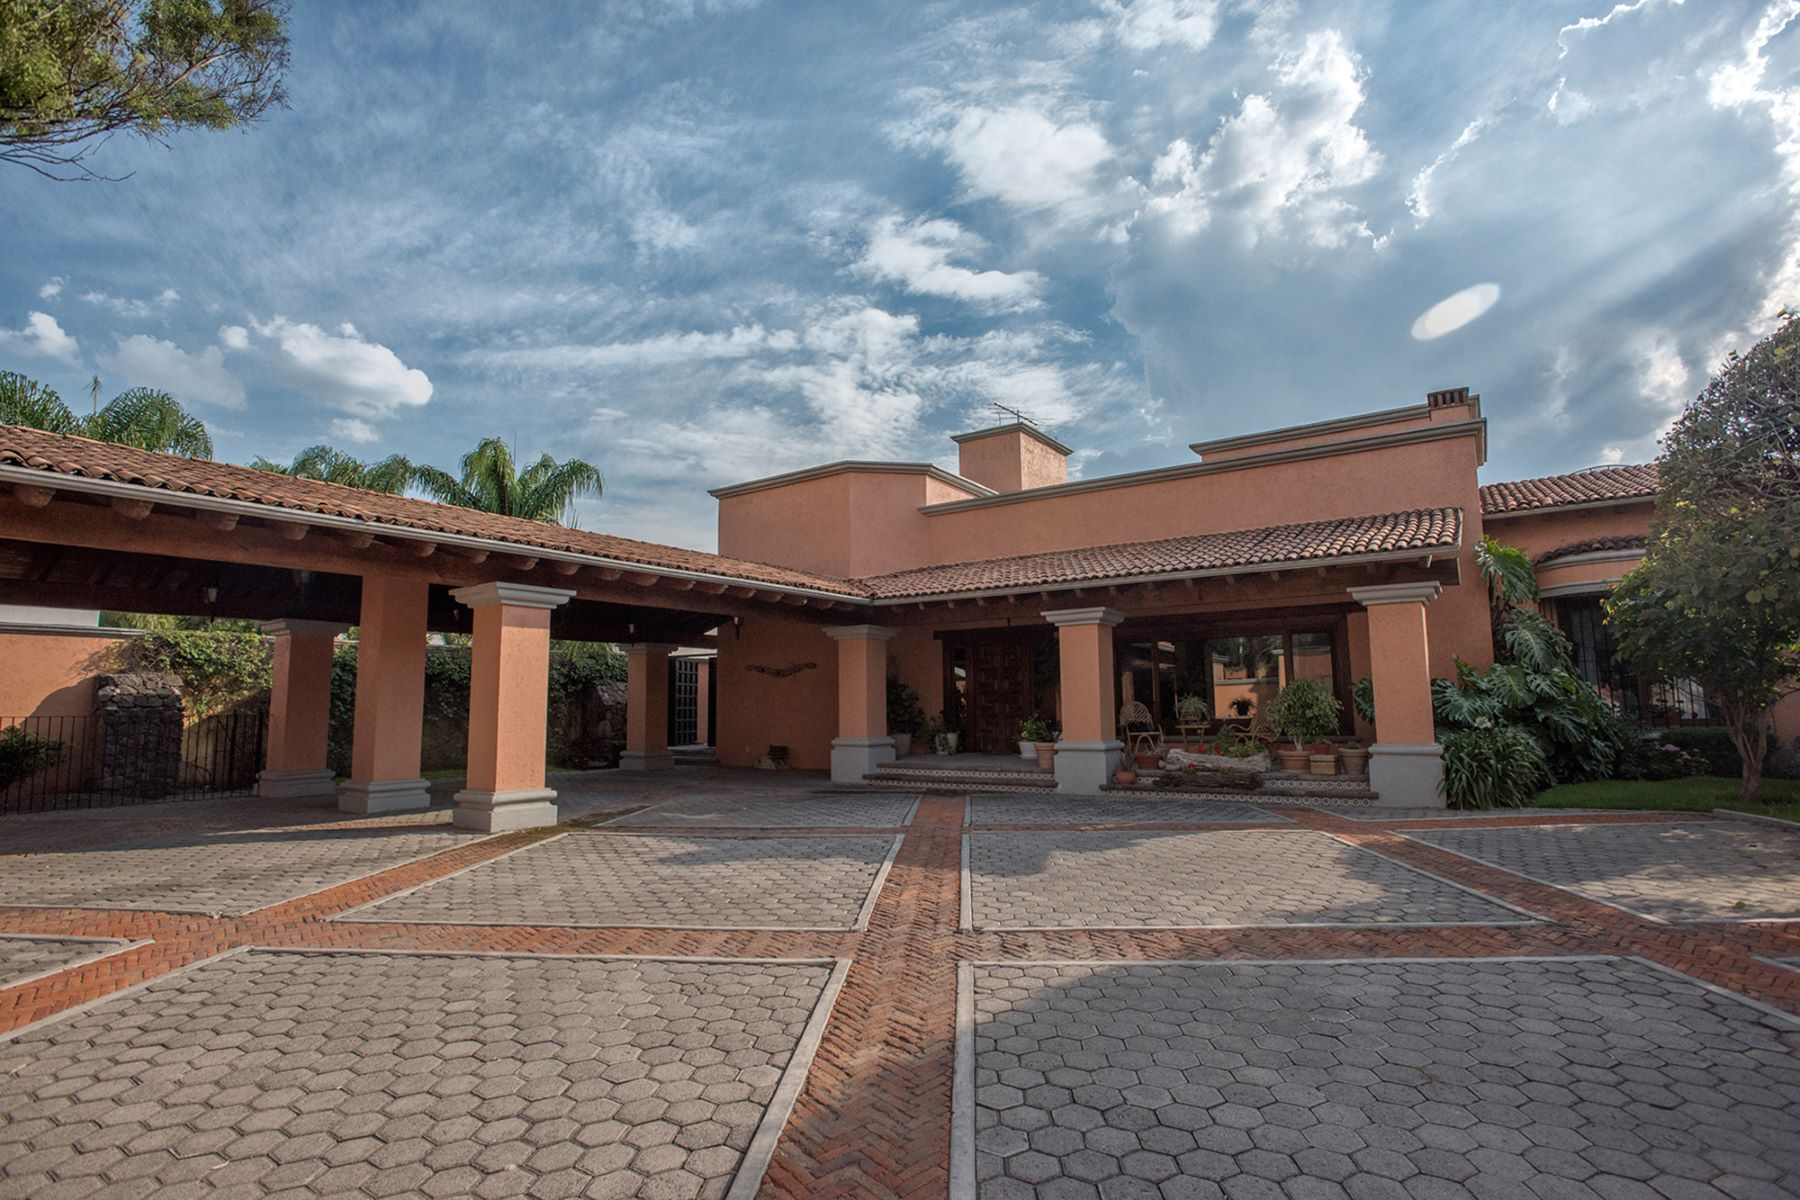 Single Family Home for Sale at Casa la Traviesa Queretaro, Queretaro, 76100 Mexico